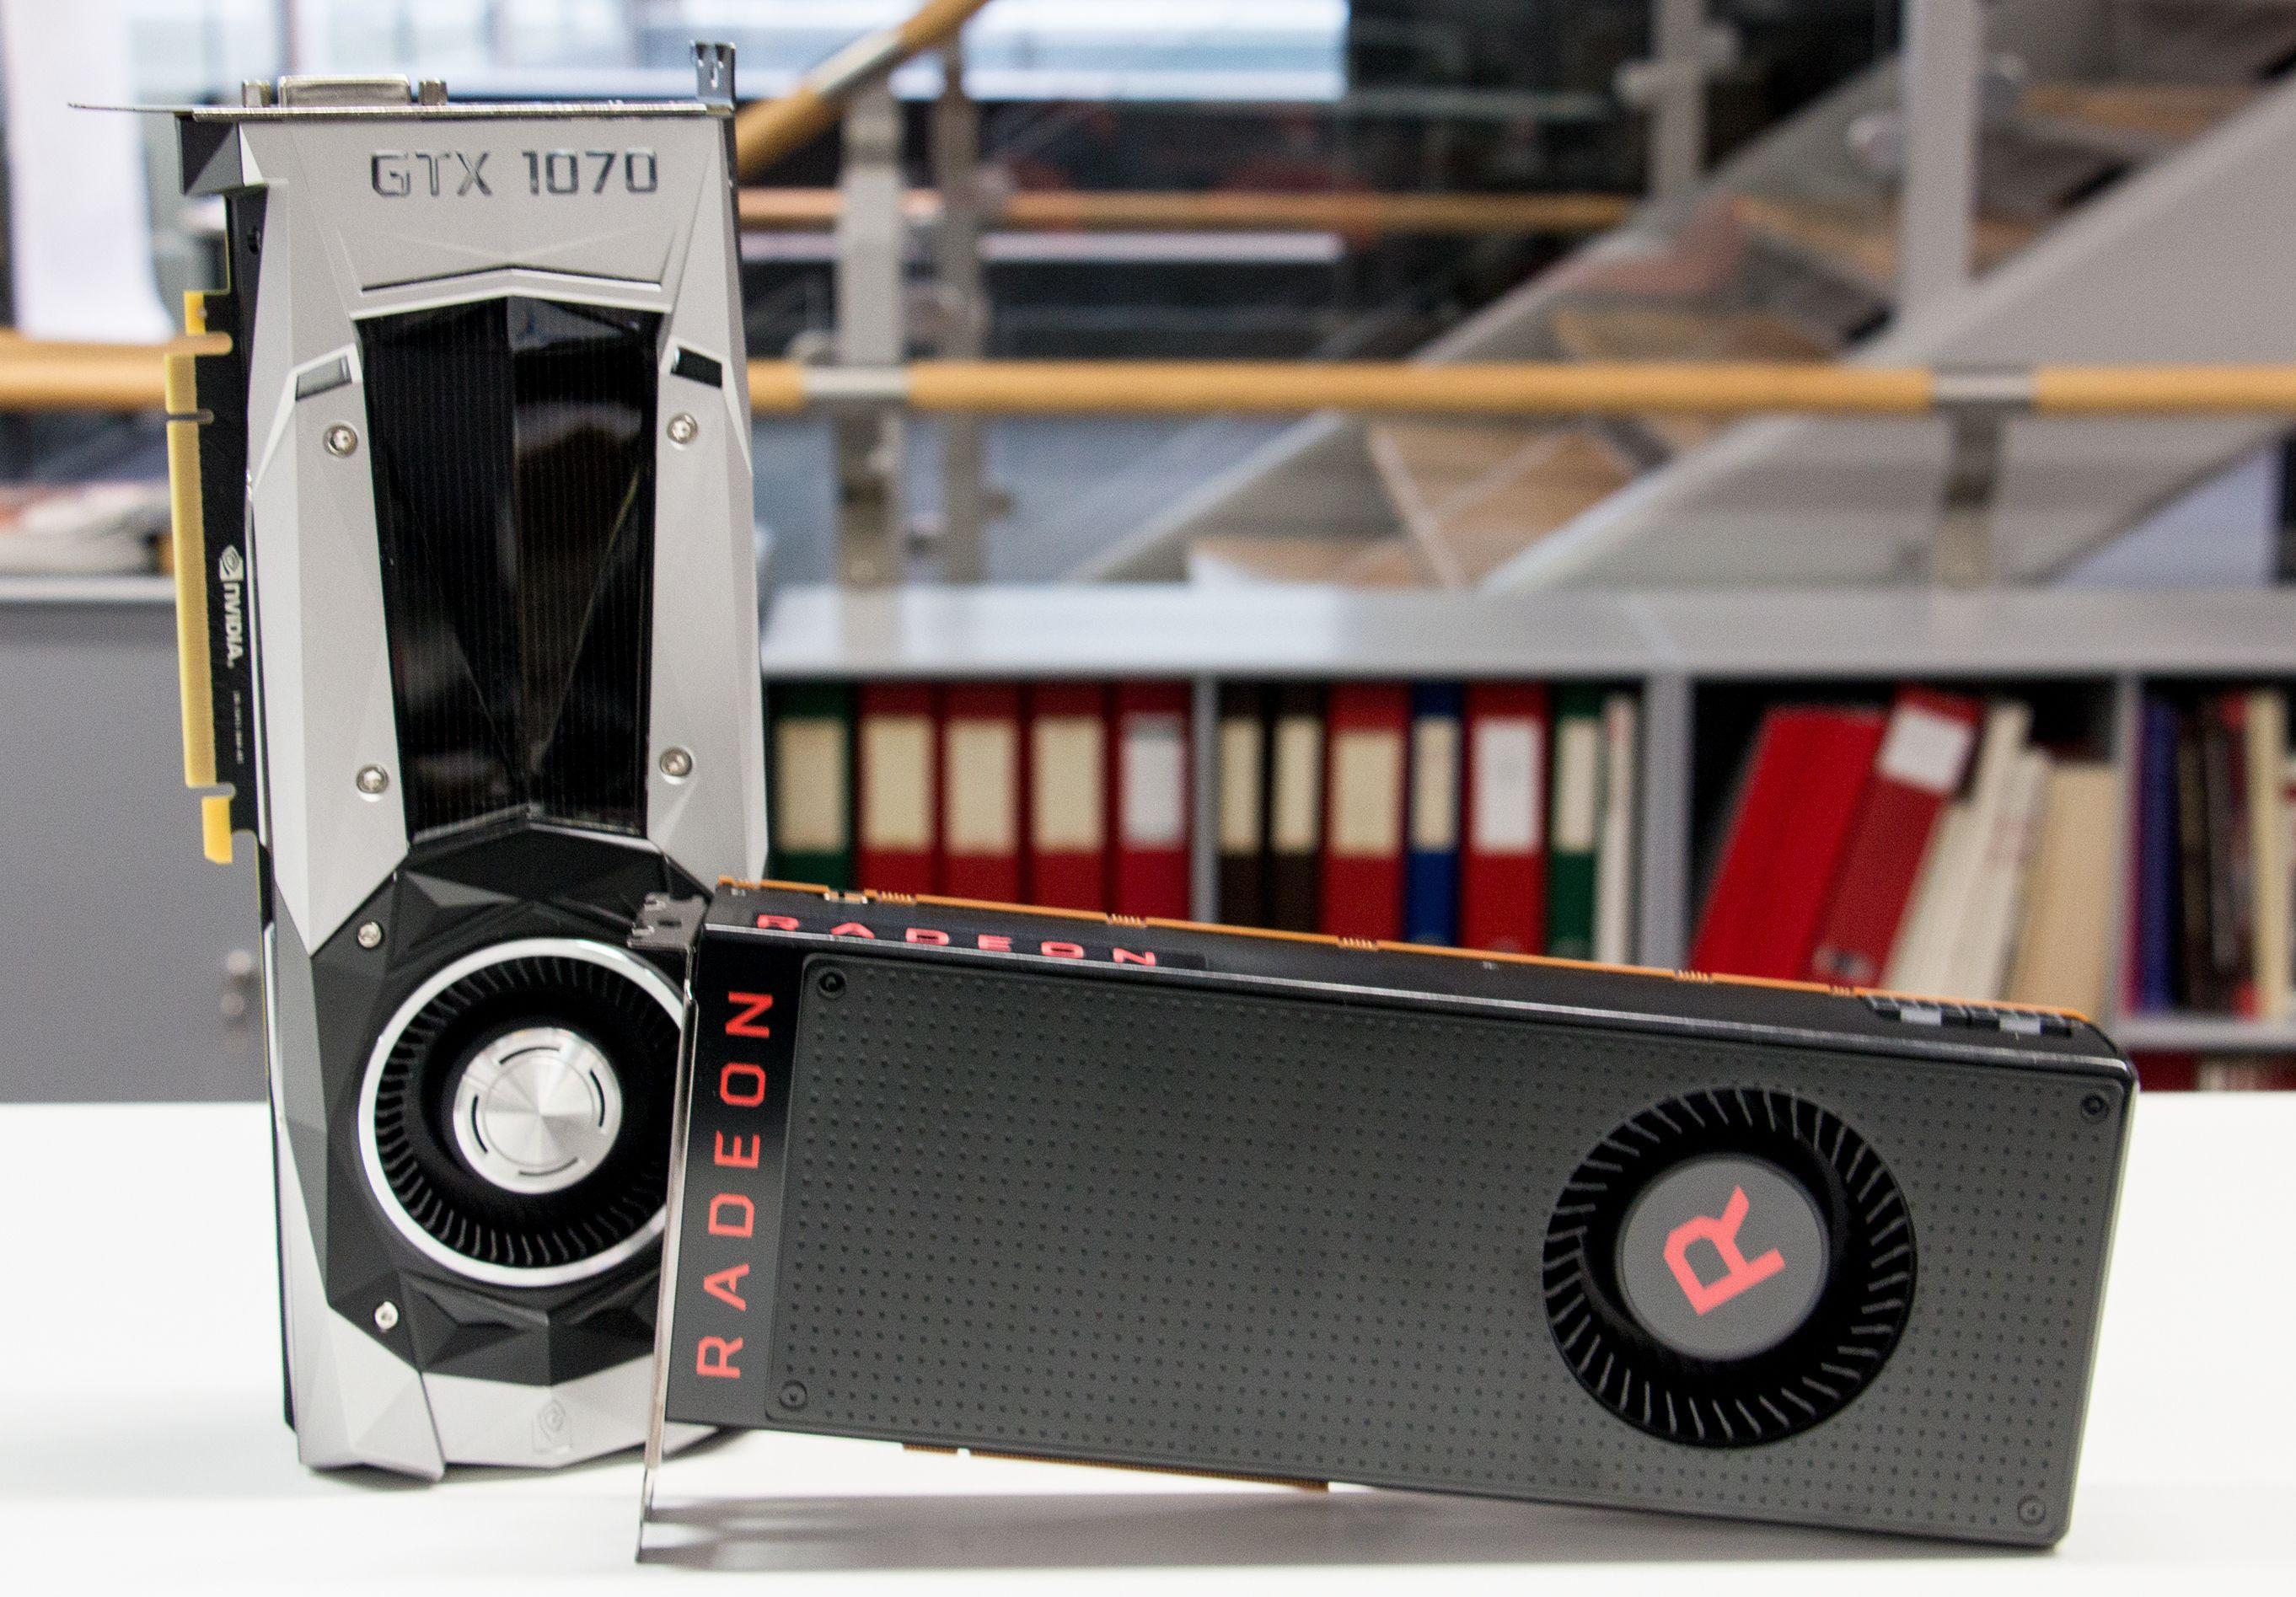 AMD RX Vega 56 konkurrerer mot Nvidias GTX 1070 i 4000-kronersklassen..